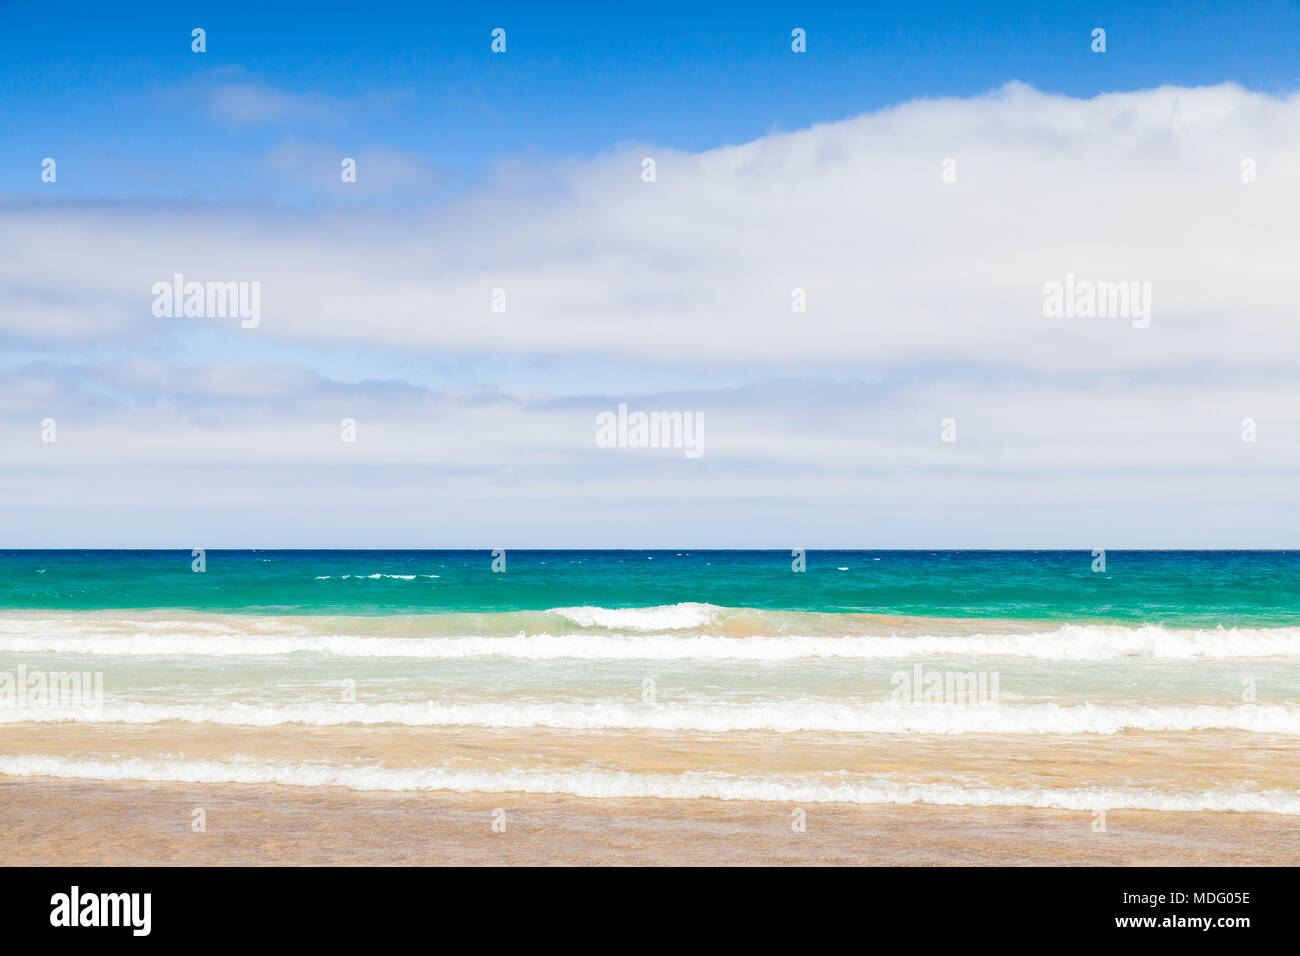 Sandy beach landscape background. Island Porto Santo in the Madeira archipelago, Portugal - Stock Image